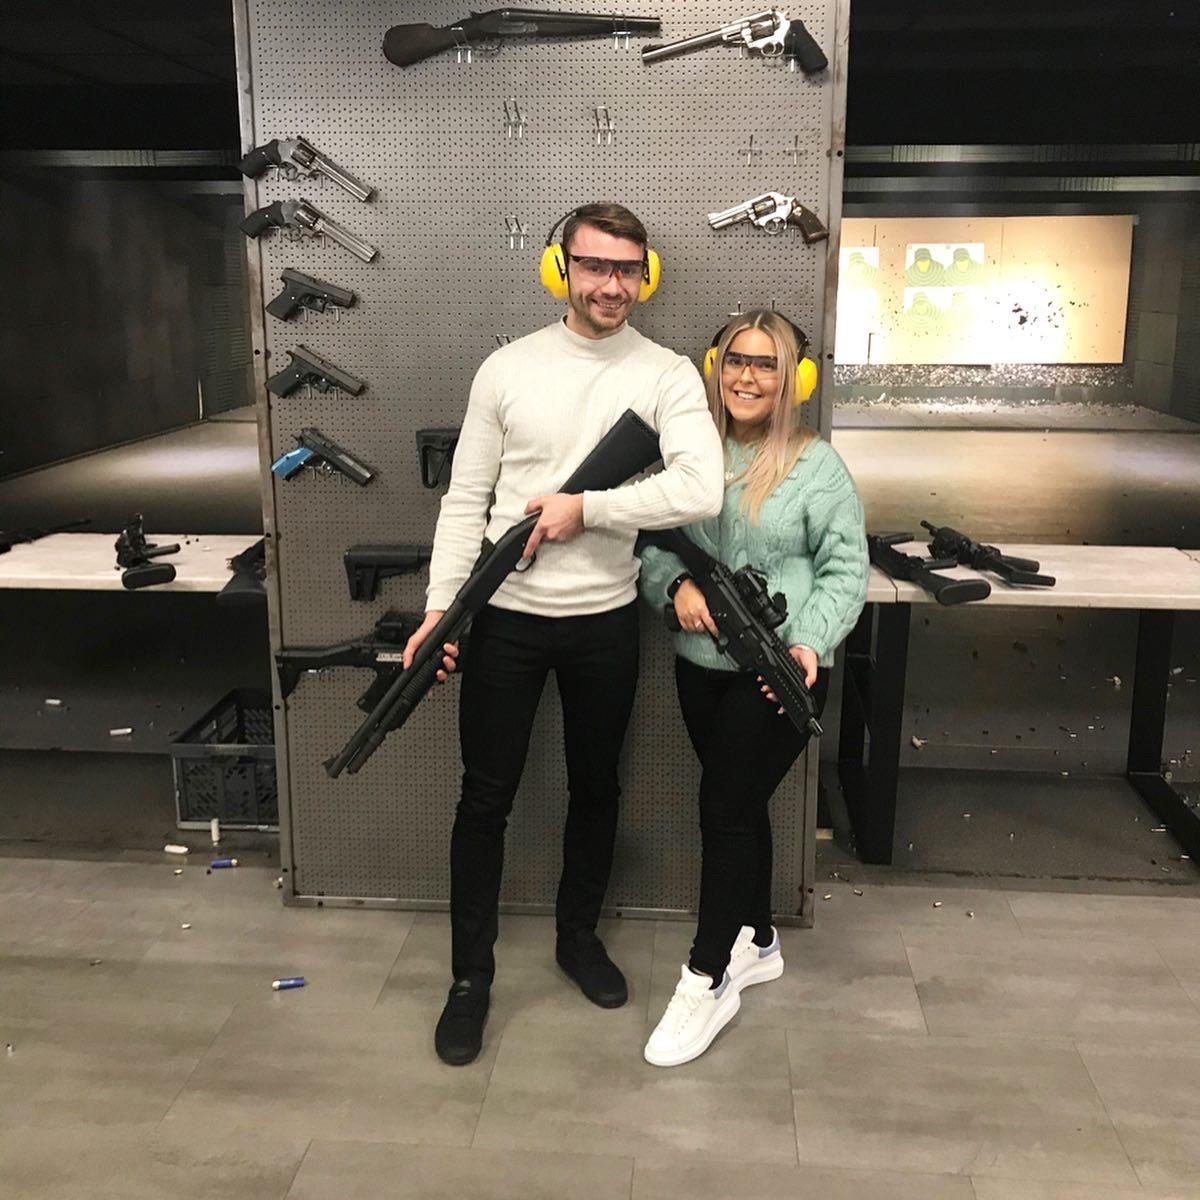 cracow shooting range